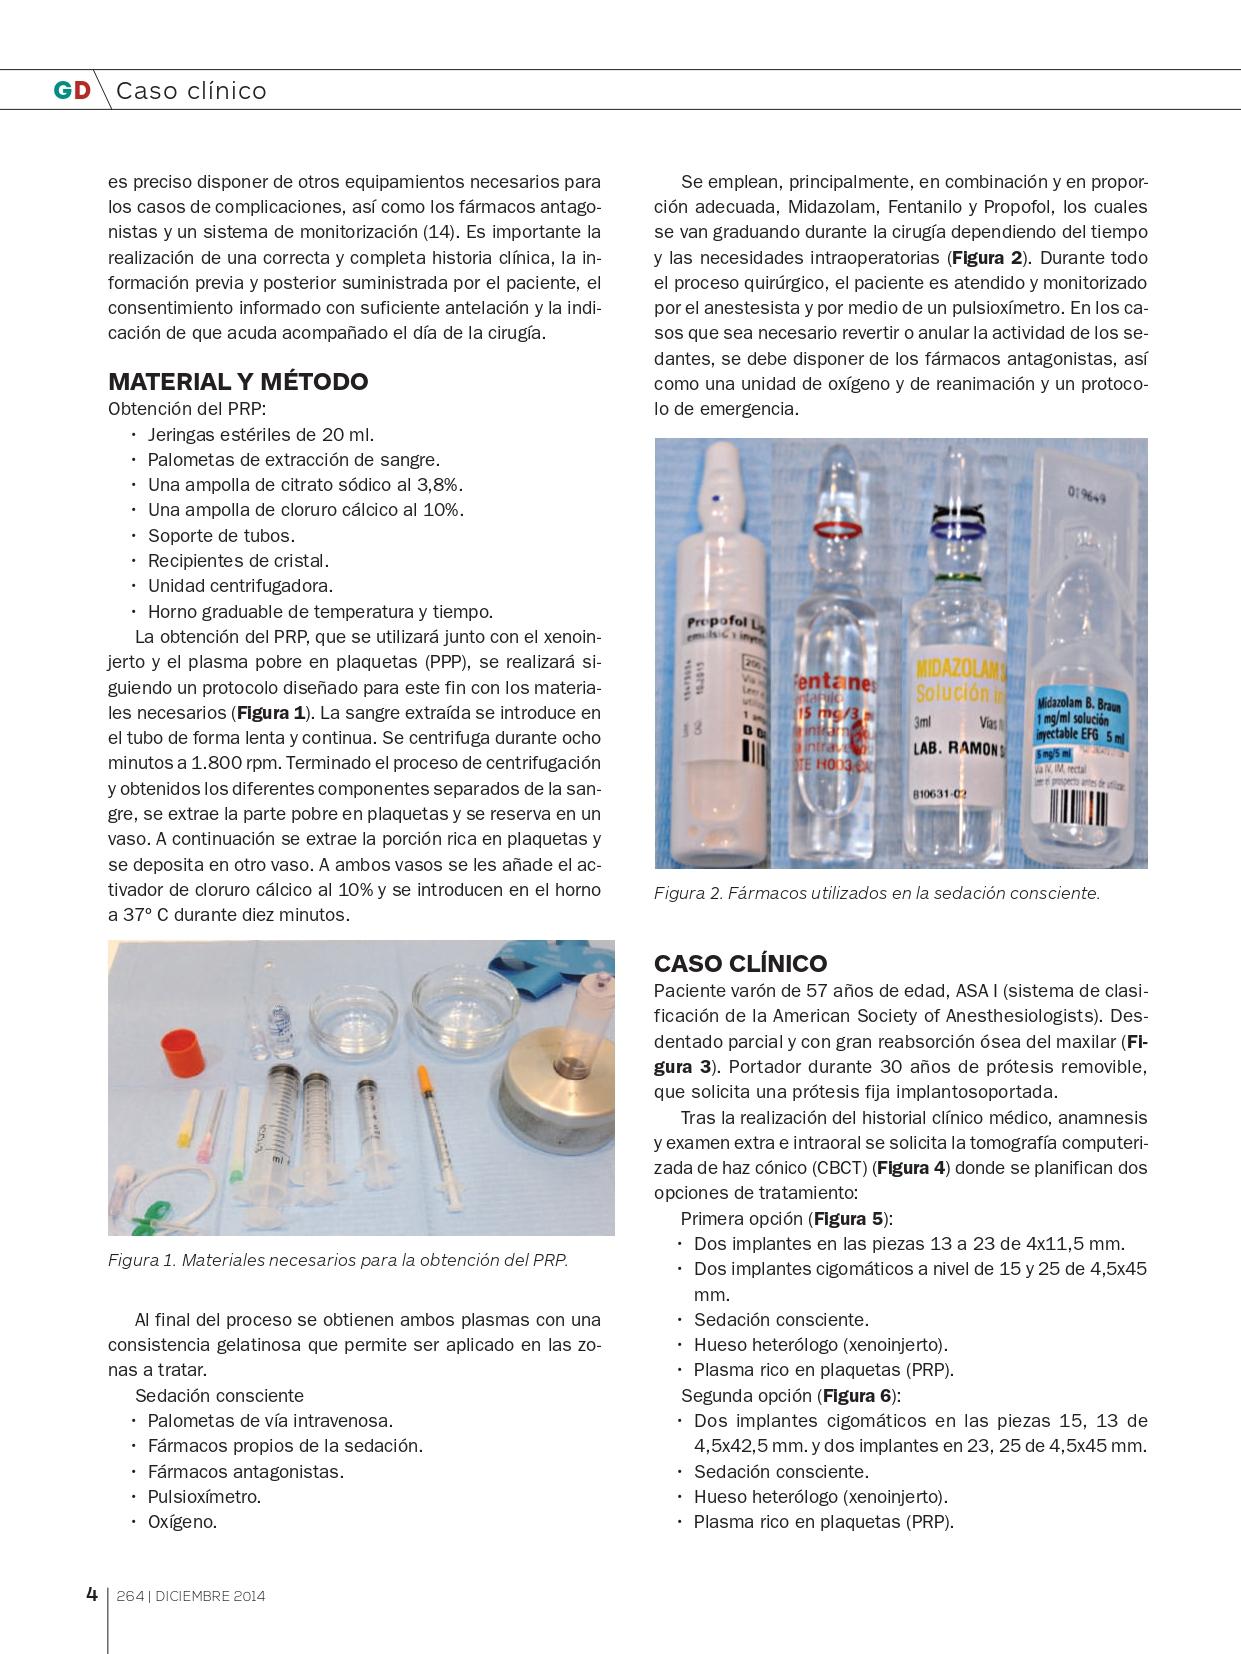 Rehabilitación-maxilar-completa-con-reabsorción-ósea-mediante-4-implantes-cigomáticos_page-0003